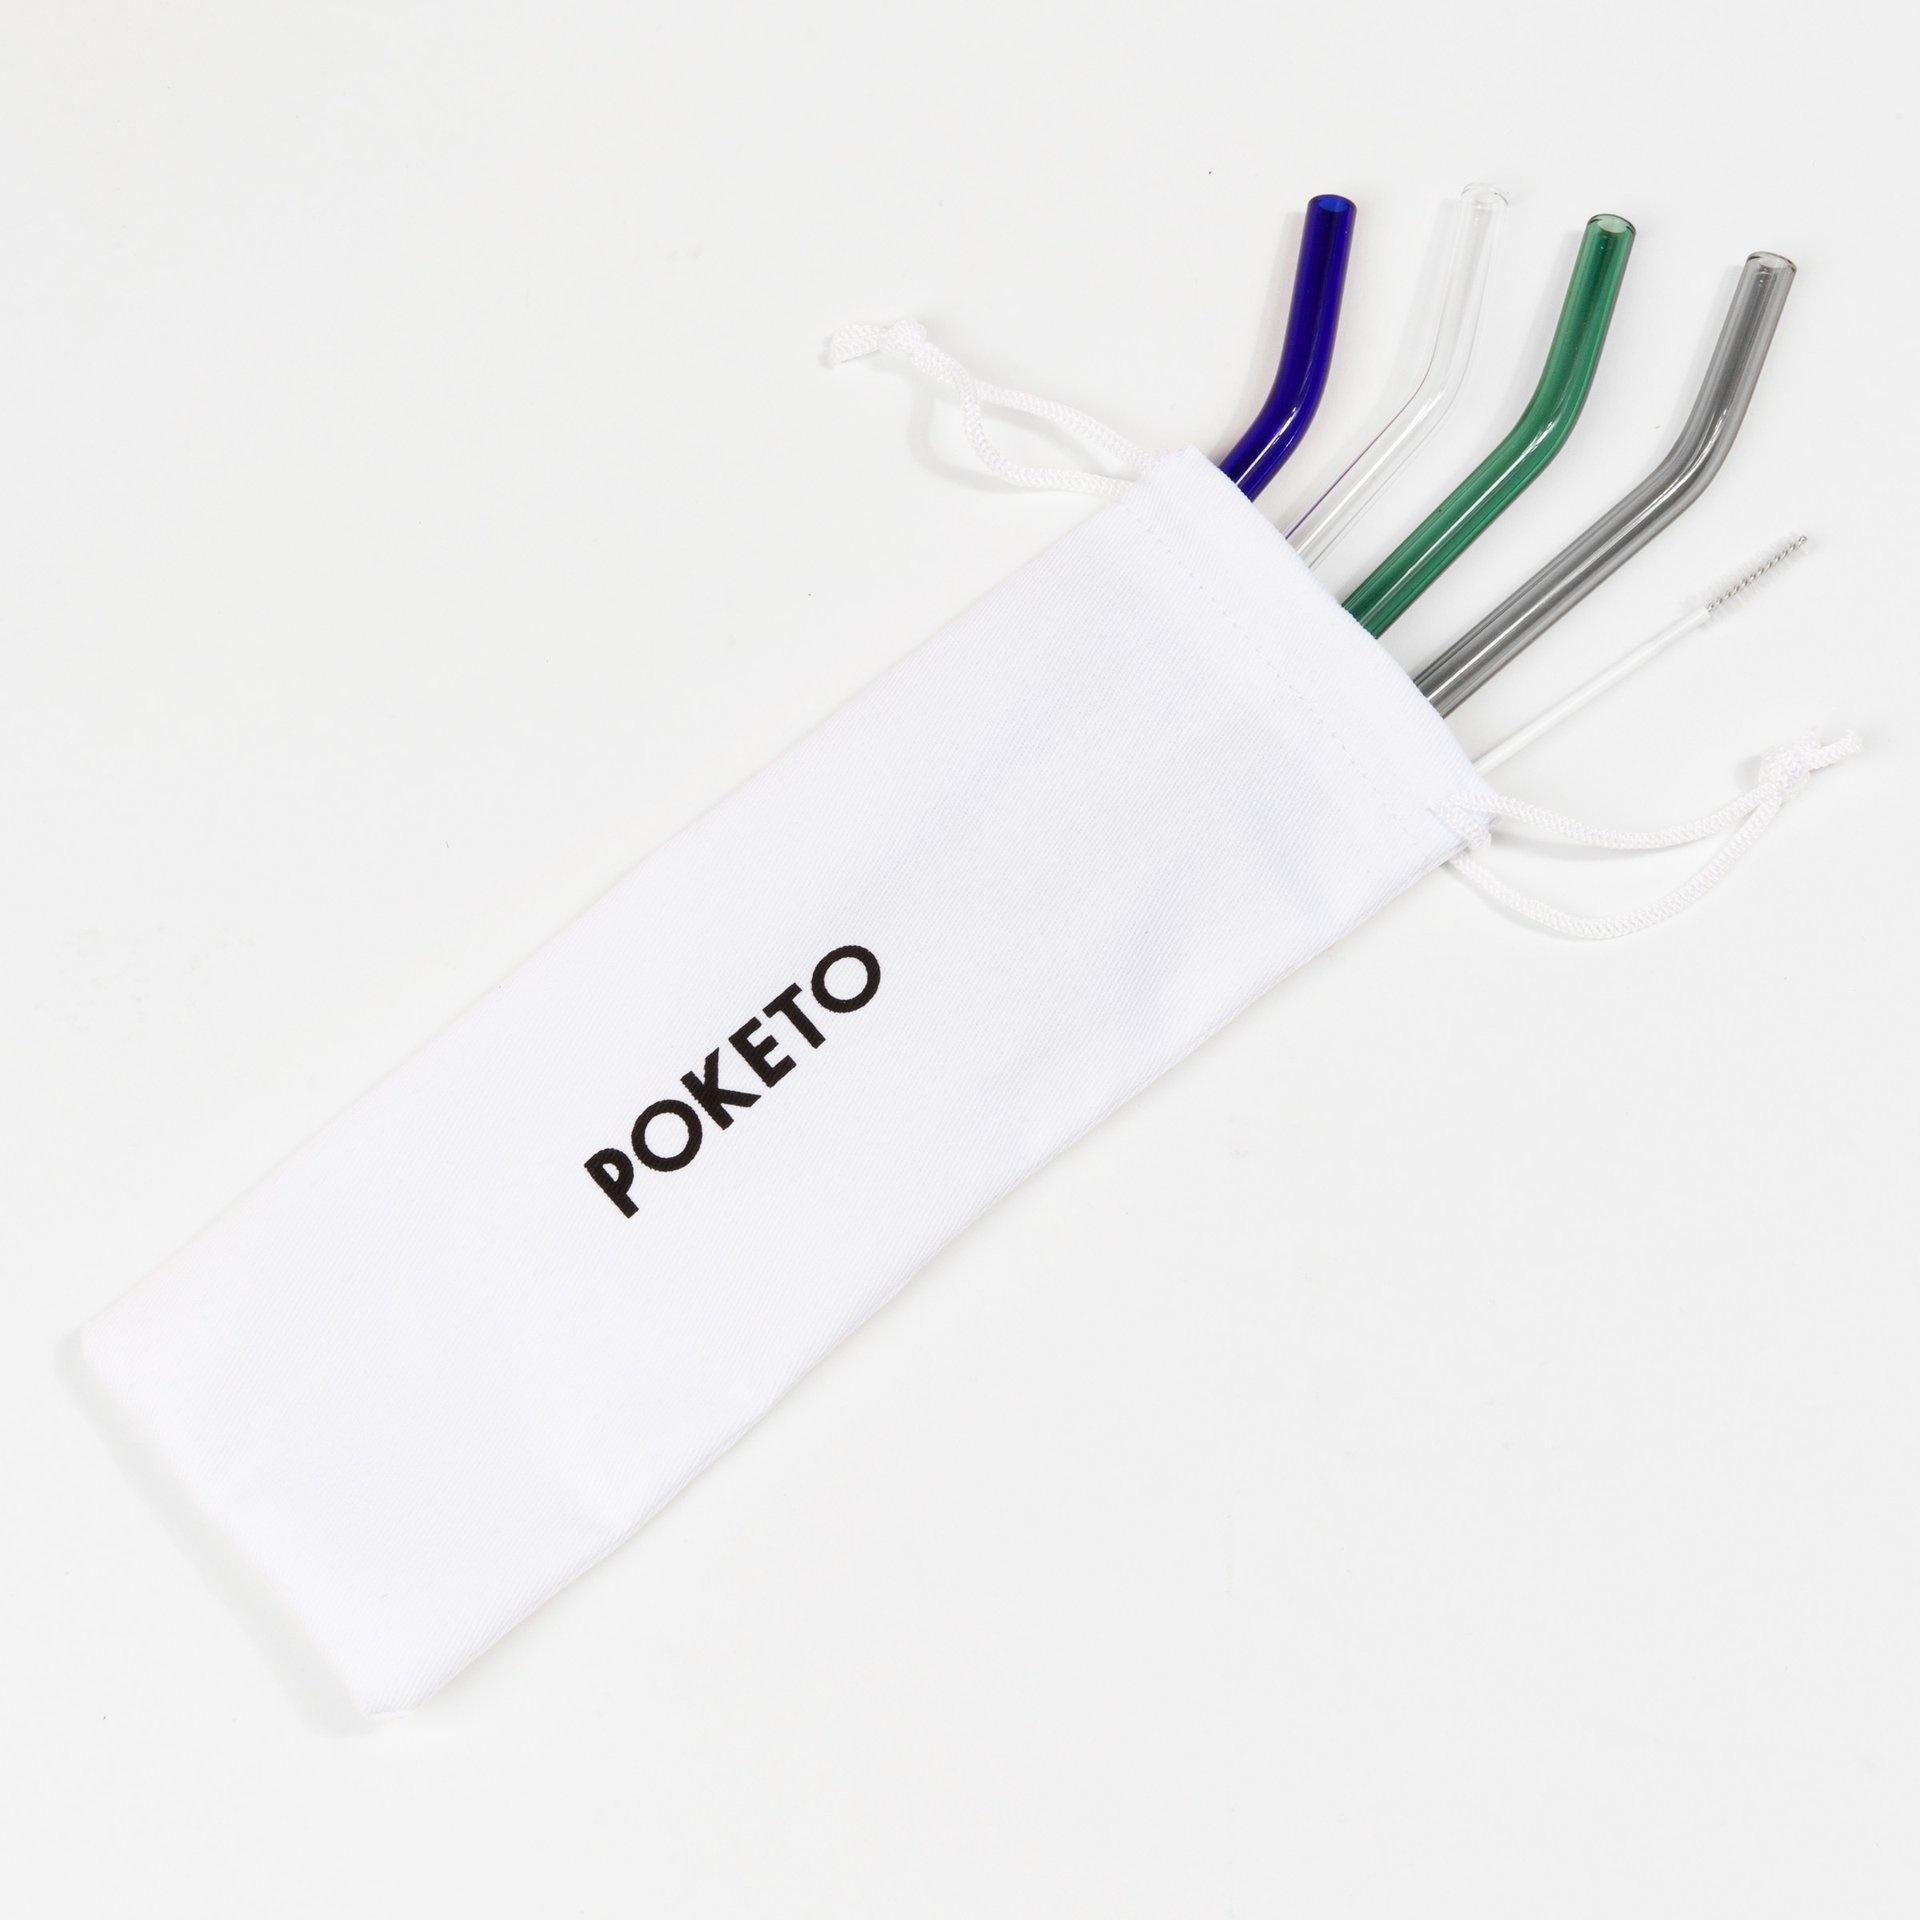 Poketo Cool Glass Straw Set